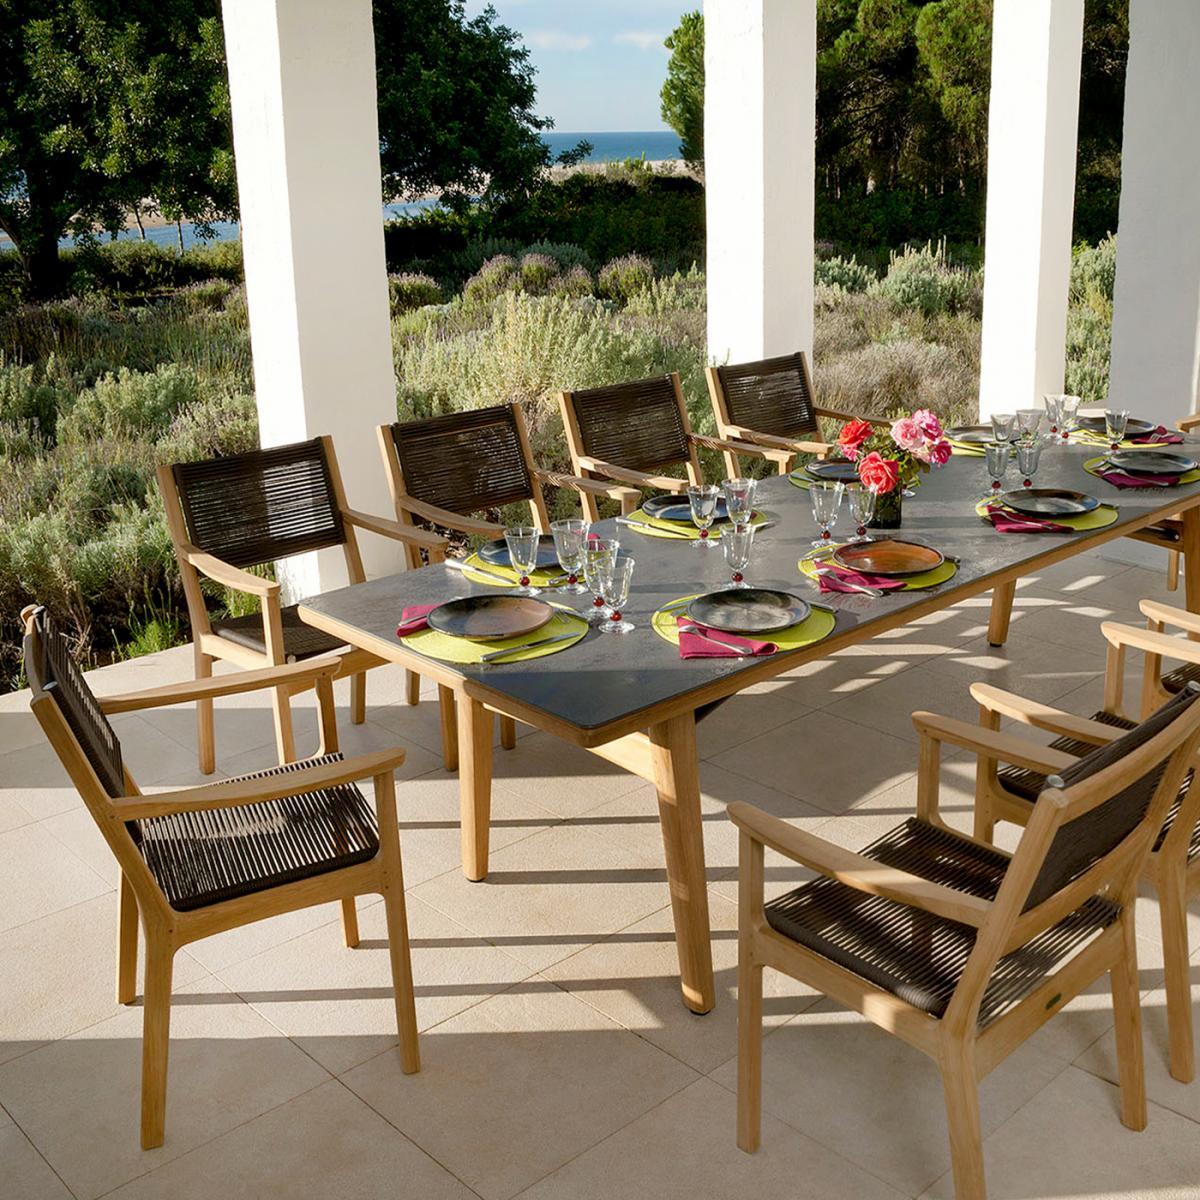 barlow tyrie equinox extending  seater dining set - clifton nurseries barlow tyrie monterey teak ceramic outdoor  seaterdining set